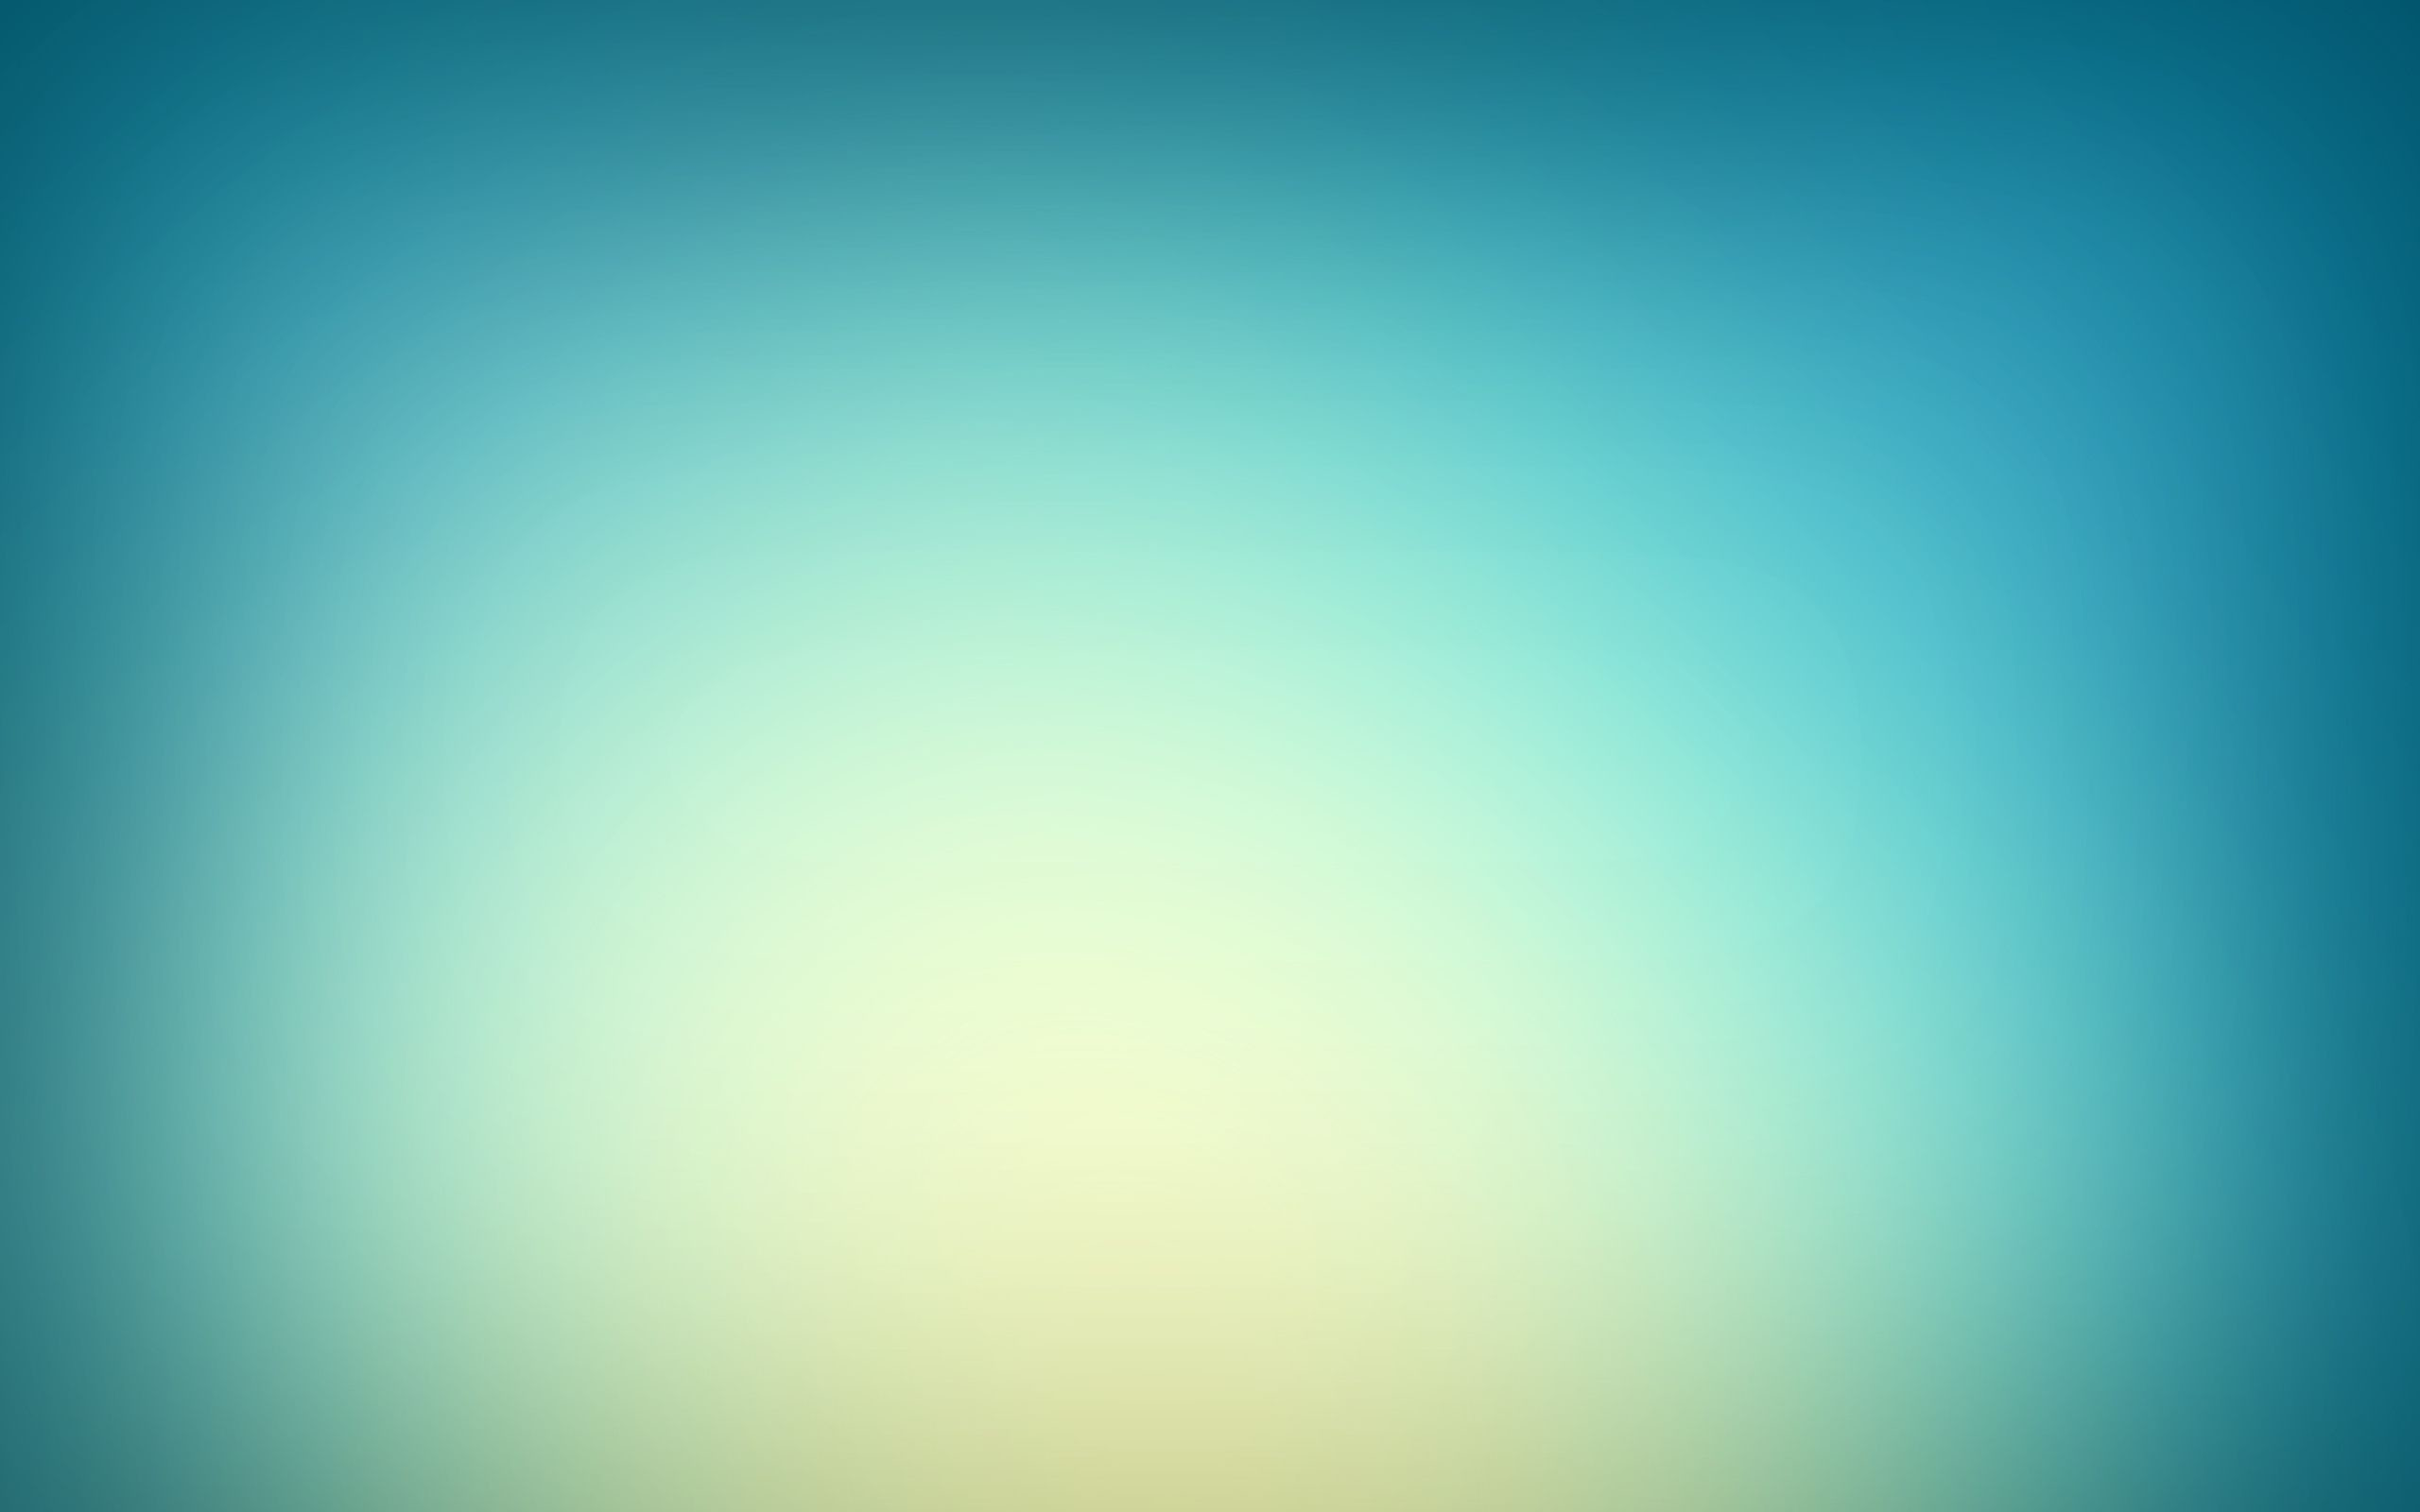 2560x1600 Gradient Background HQ Desktop Wallpaper 16355